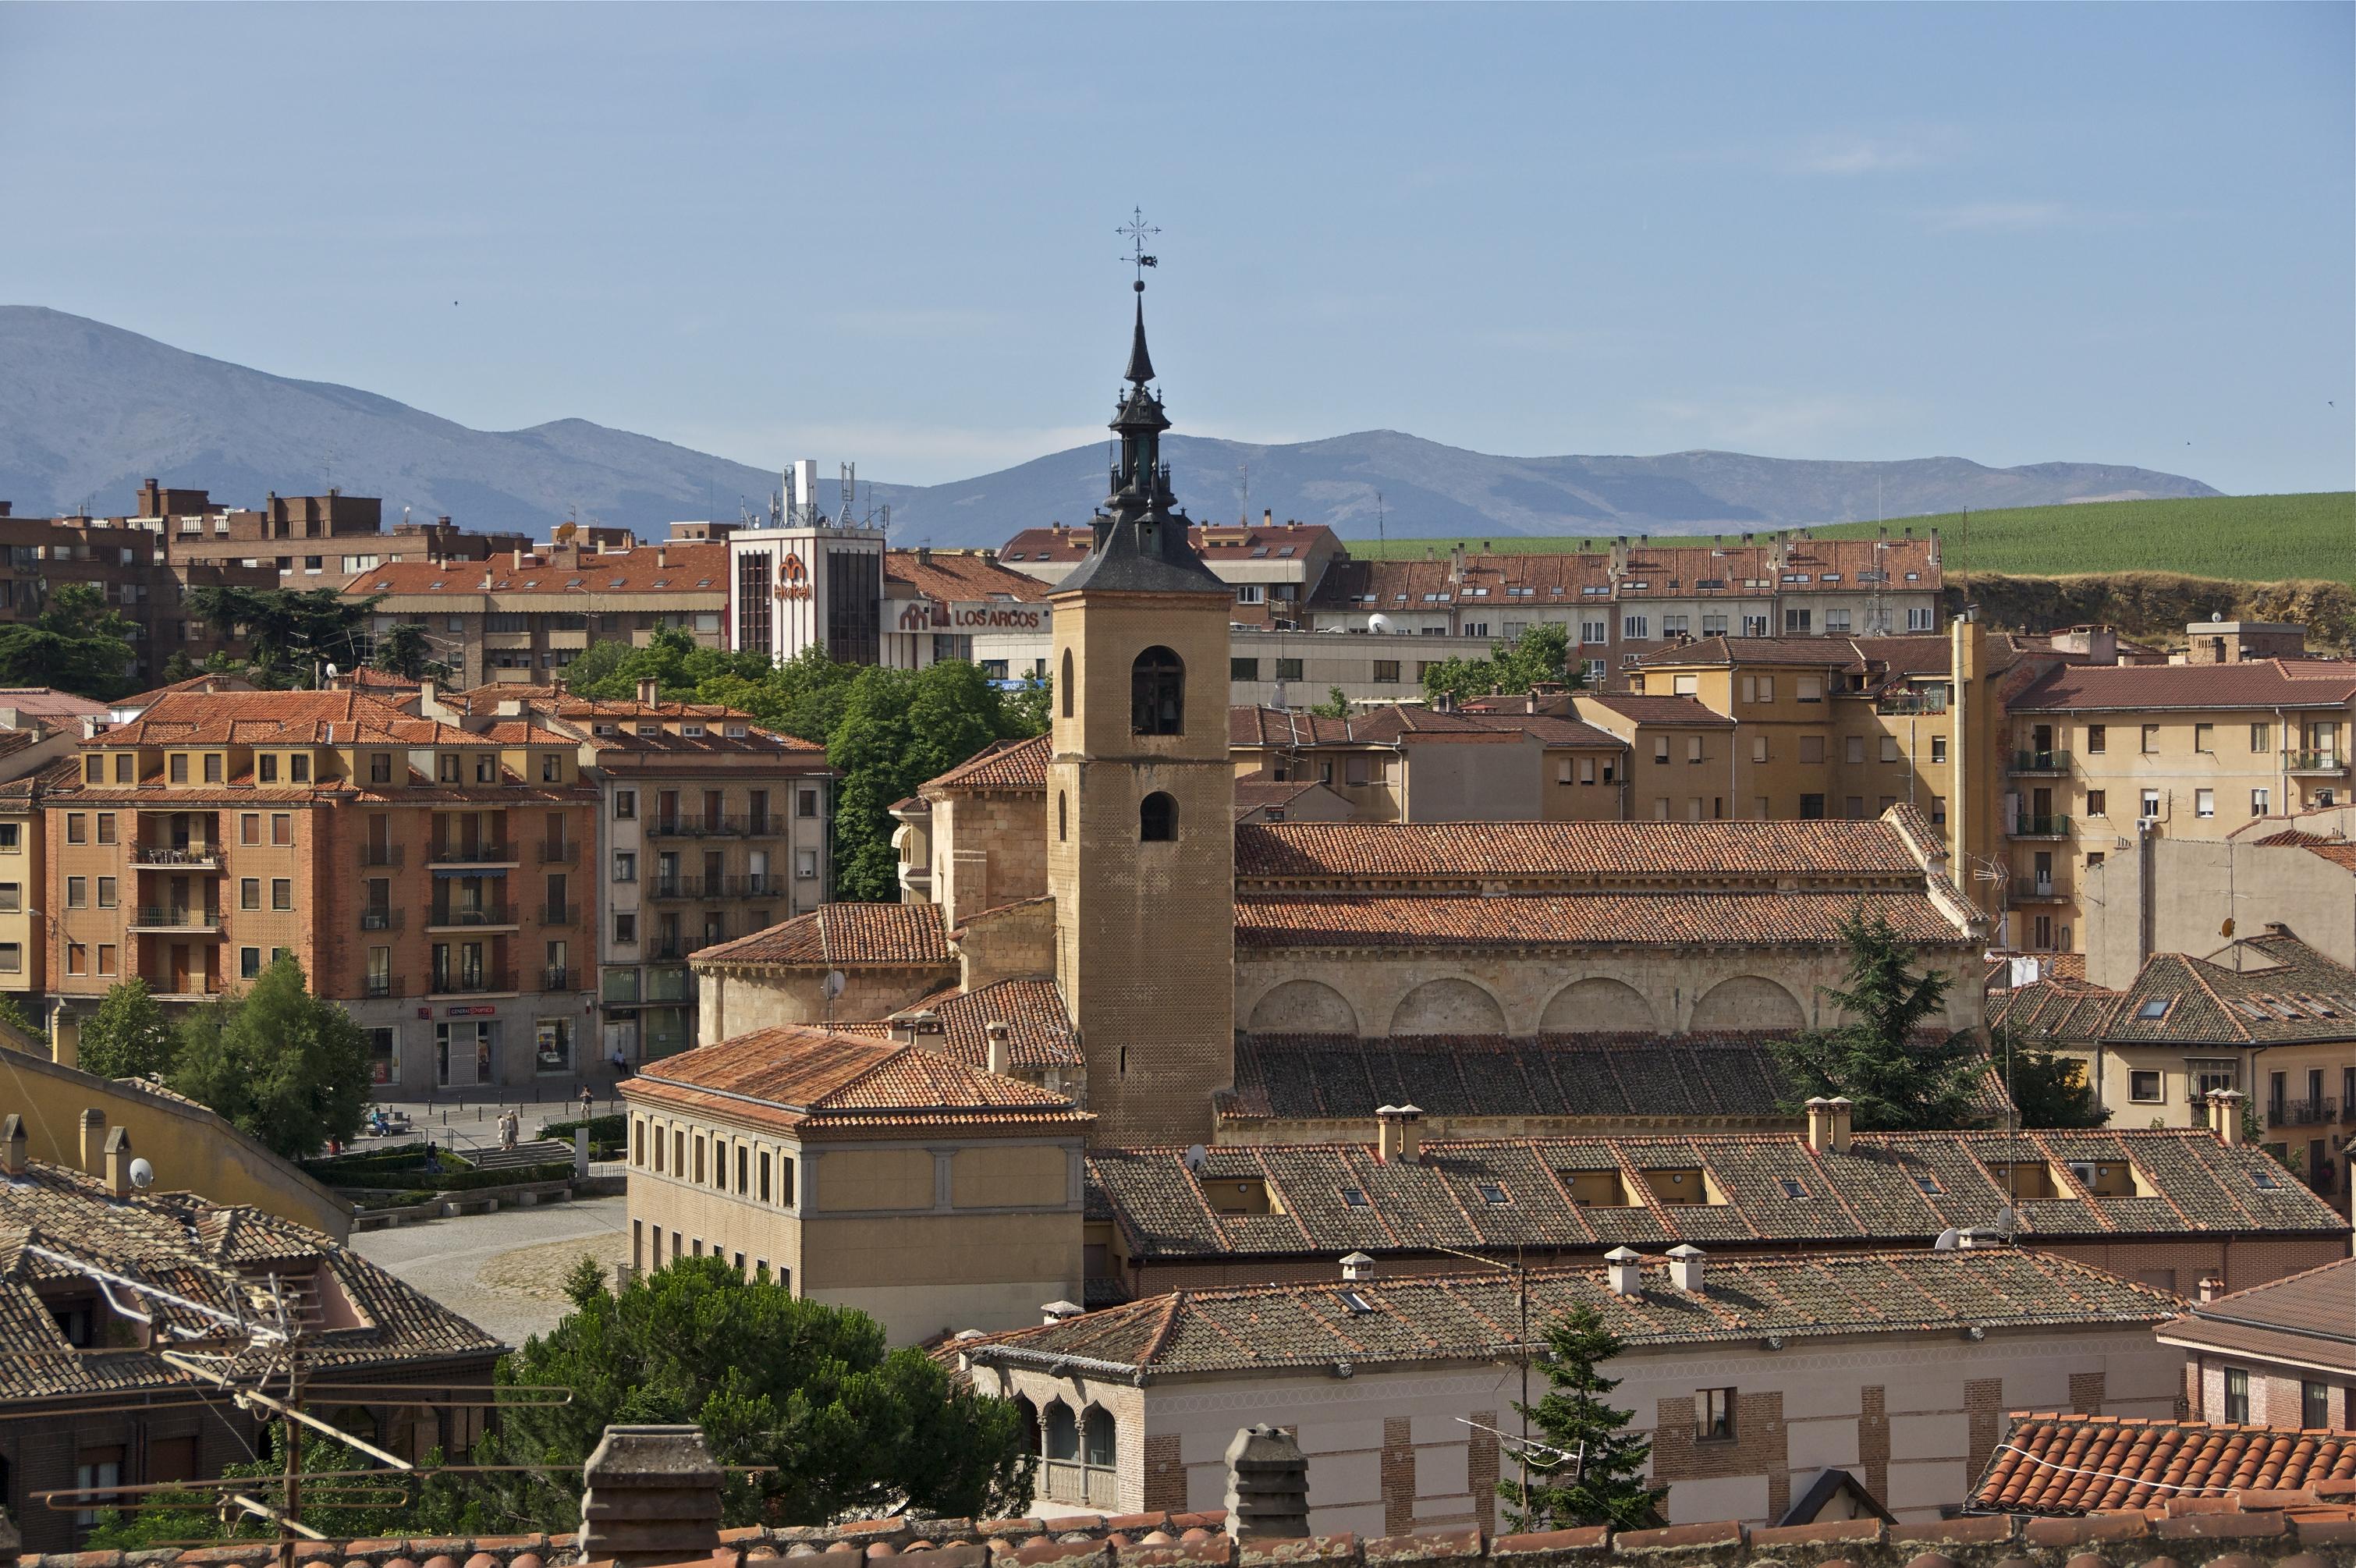 Segovia Spain  city photos gallery : Description San Millan Segovia Spain